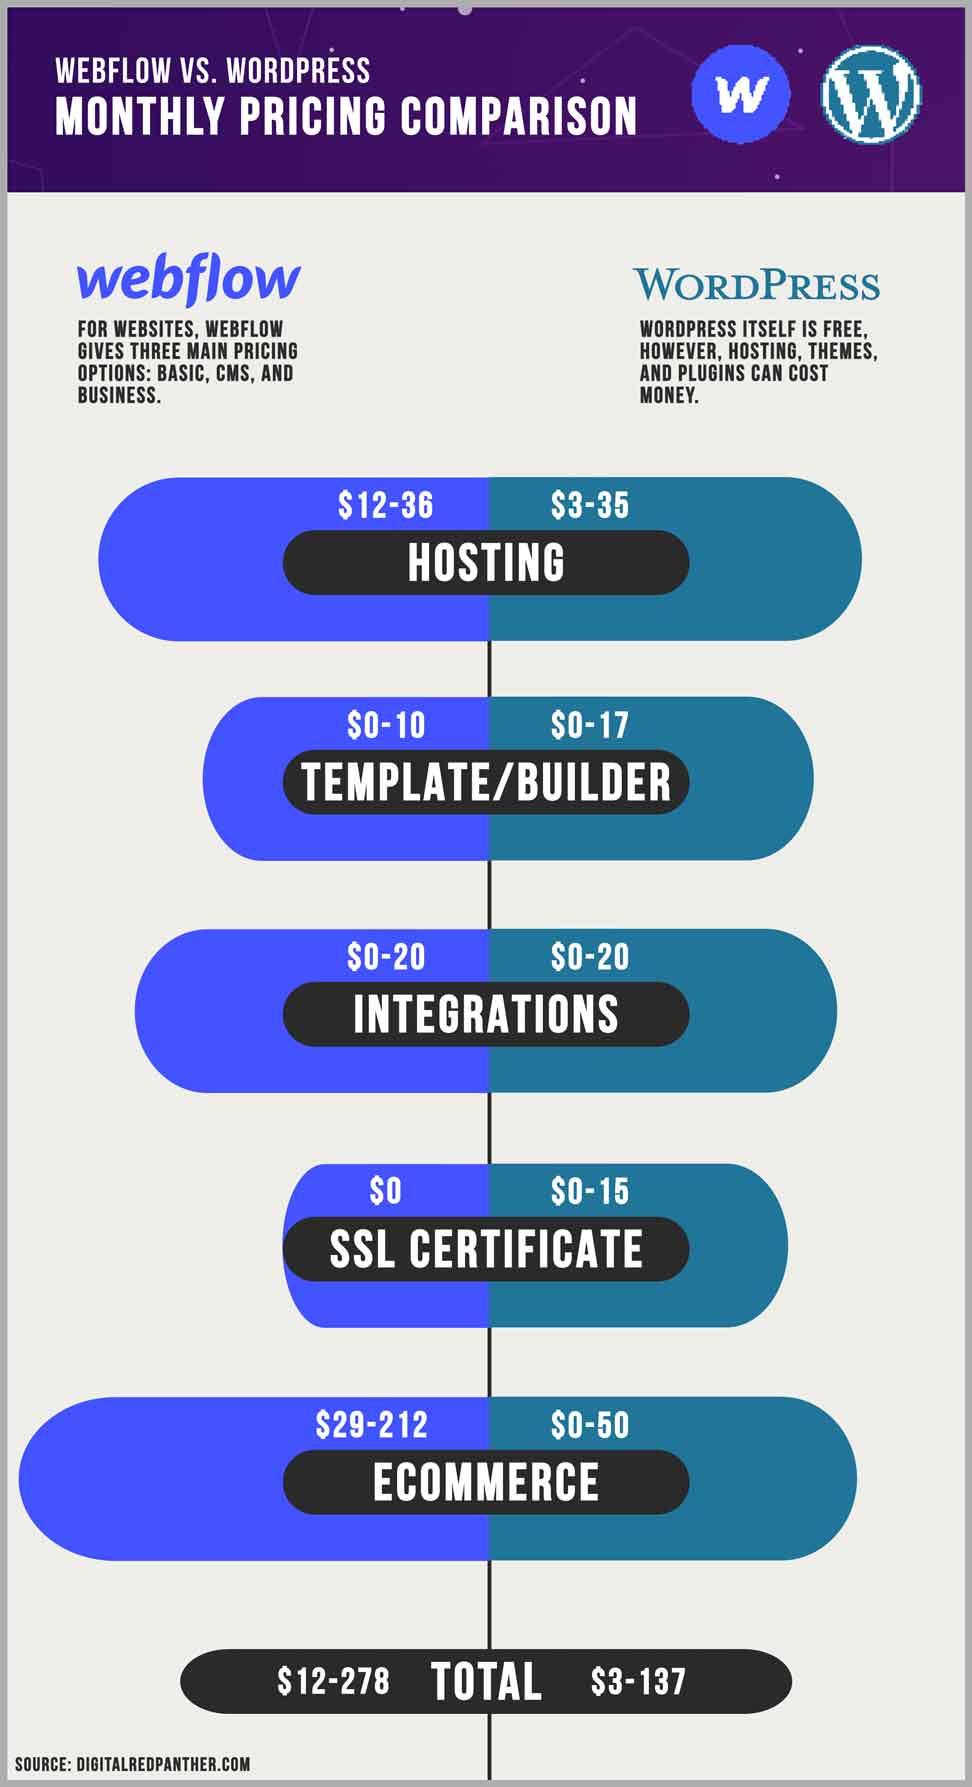 webflow vs. wordpress pricing comparison chart